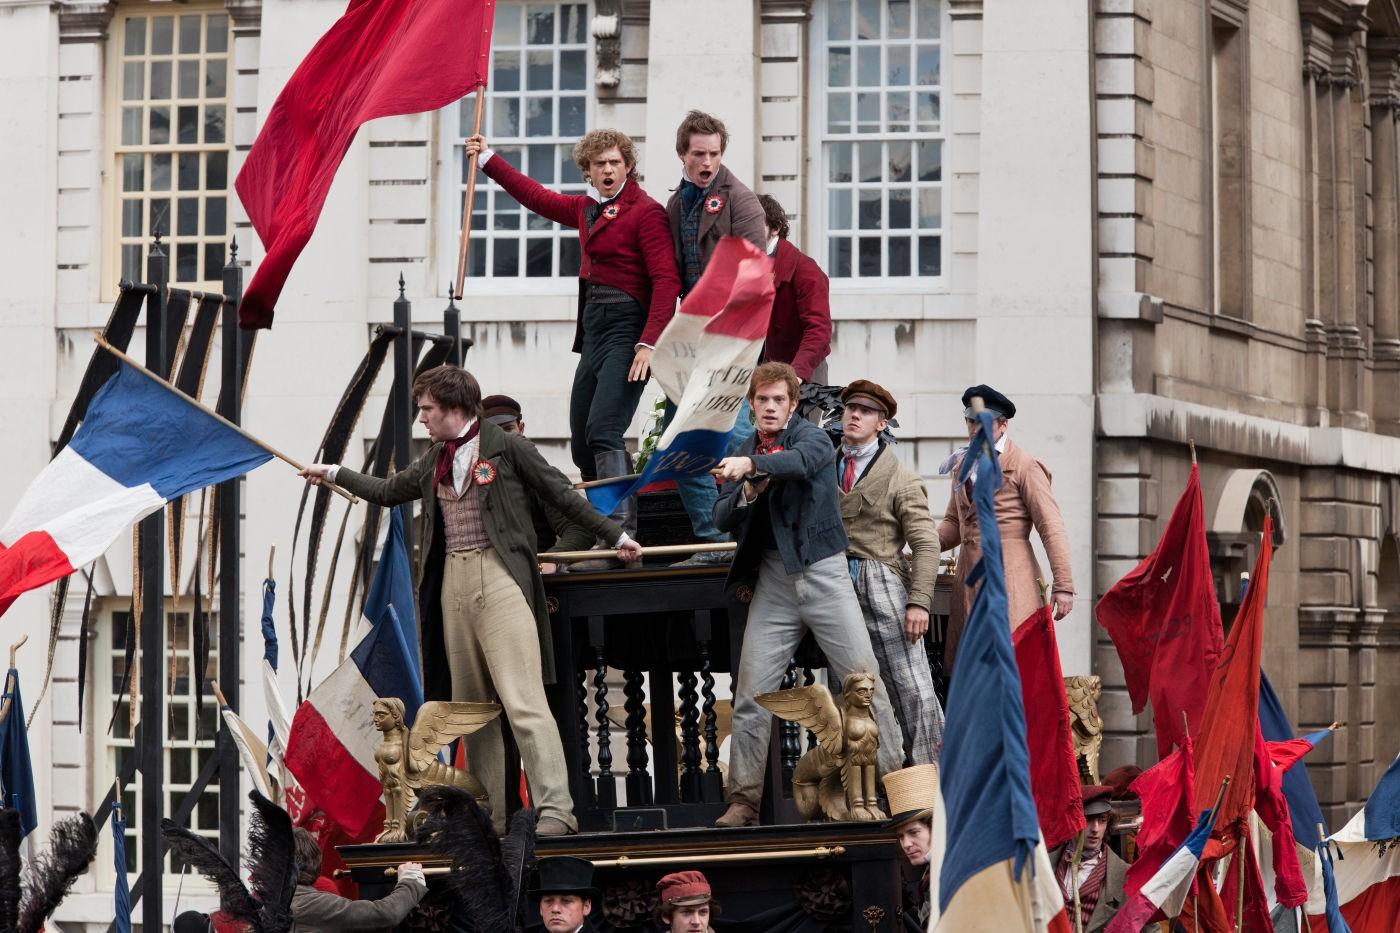 http://2.bp.blogspot.com/-UYF2sNAGS74/UPnzoCZ9jzI/AAAAAAAAOc8/3EW6nFHl2Hg/s1600/les-miserables-picture04.jpg